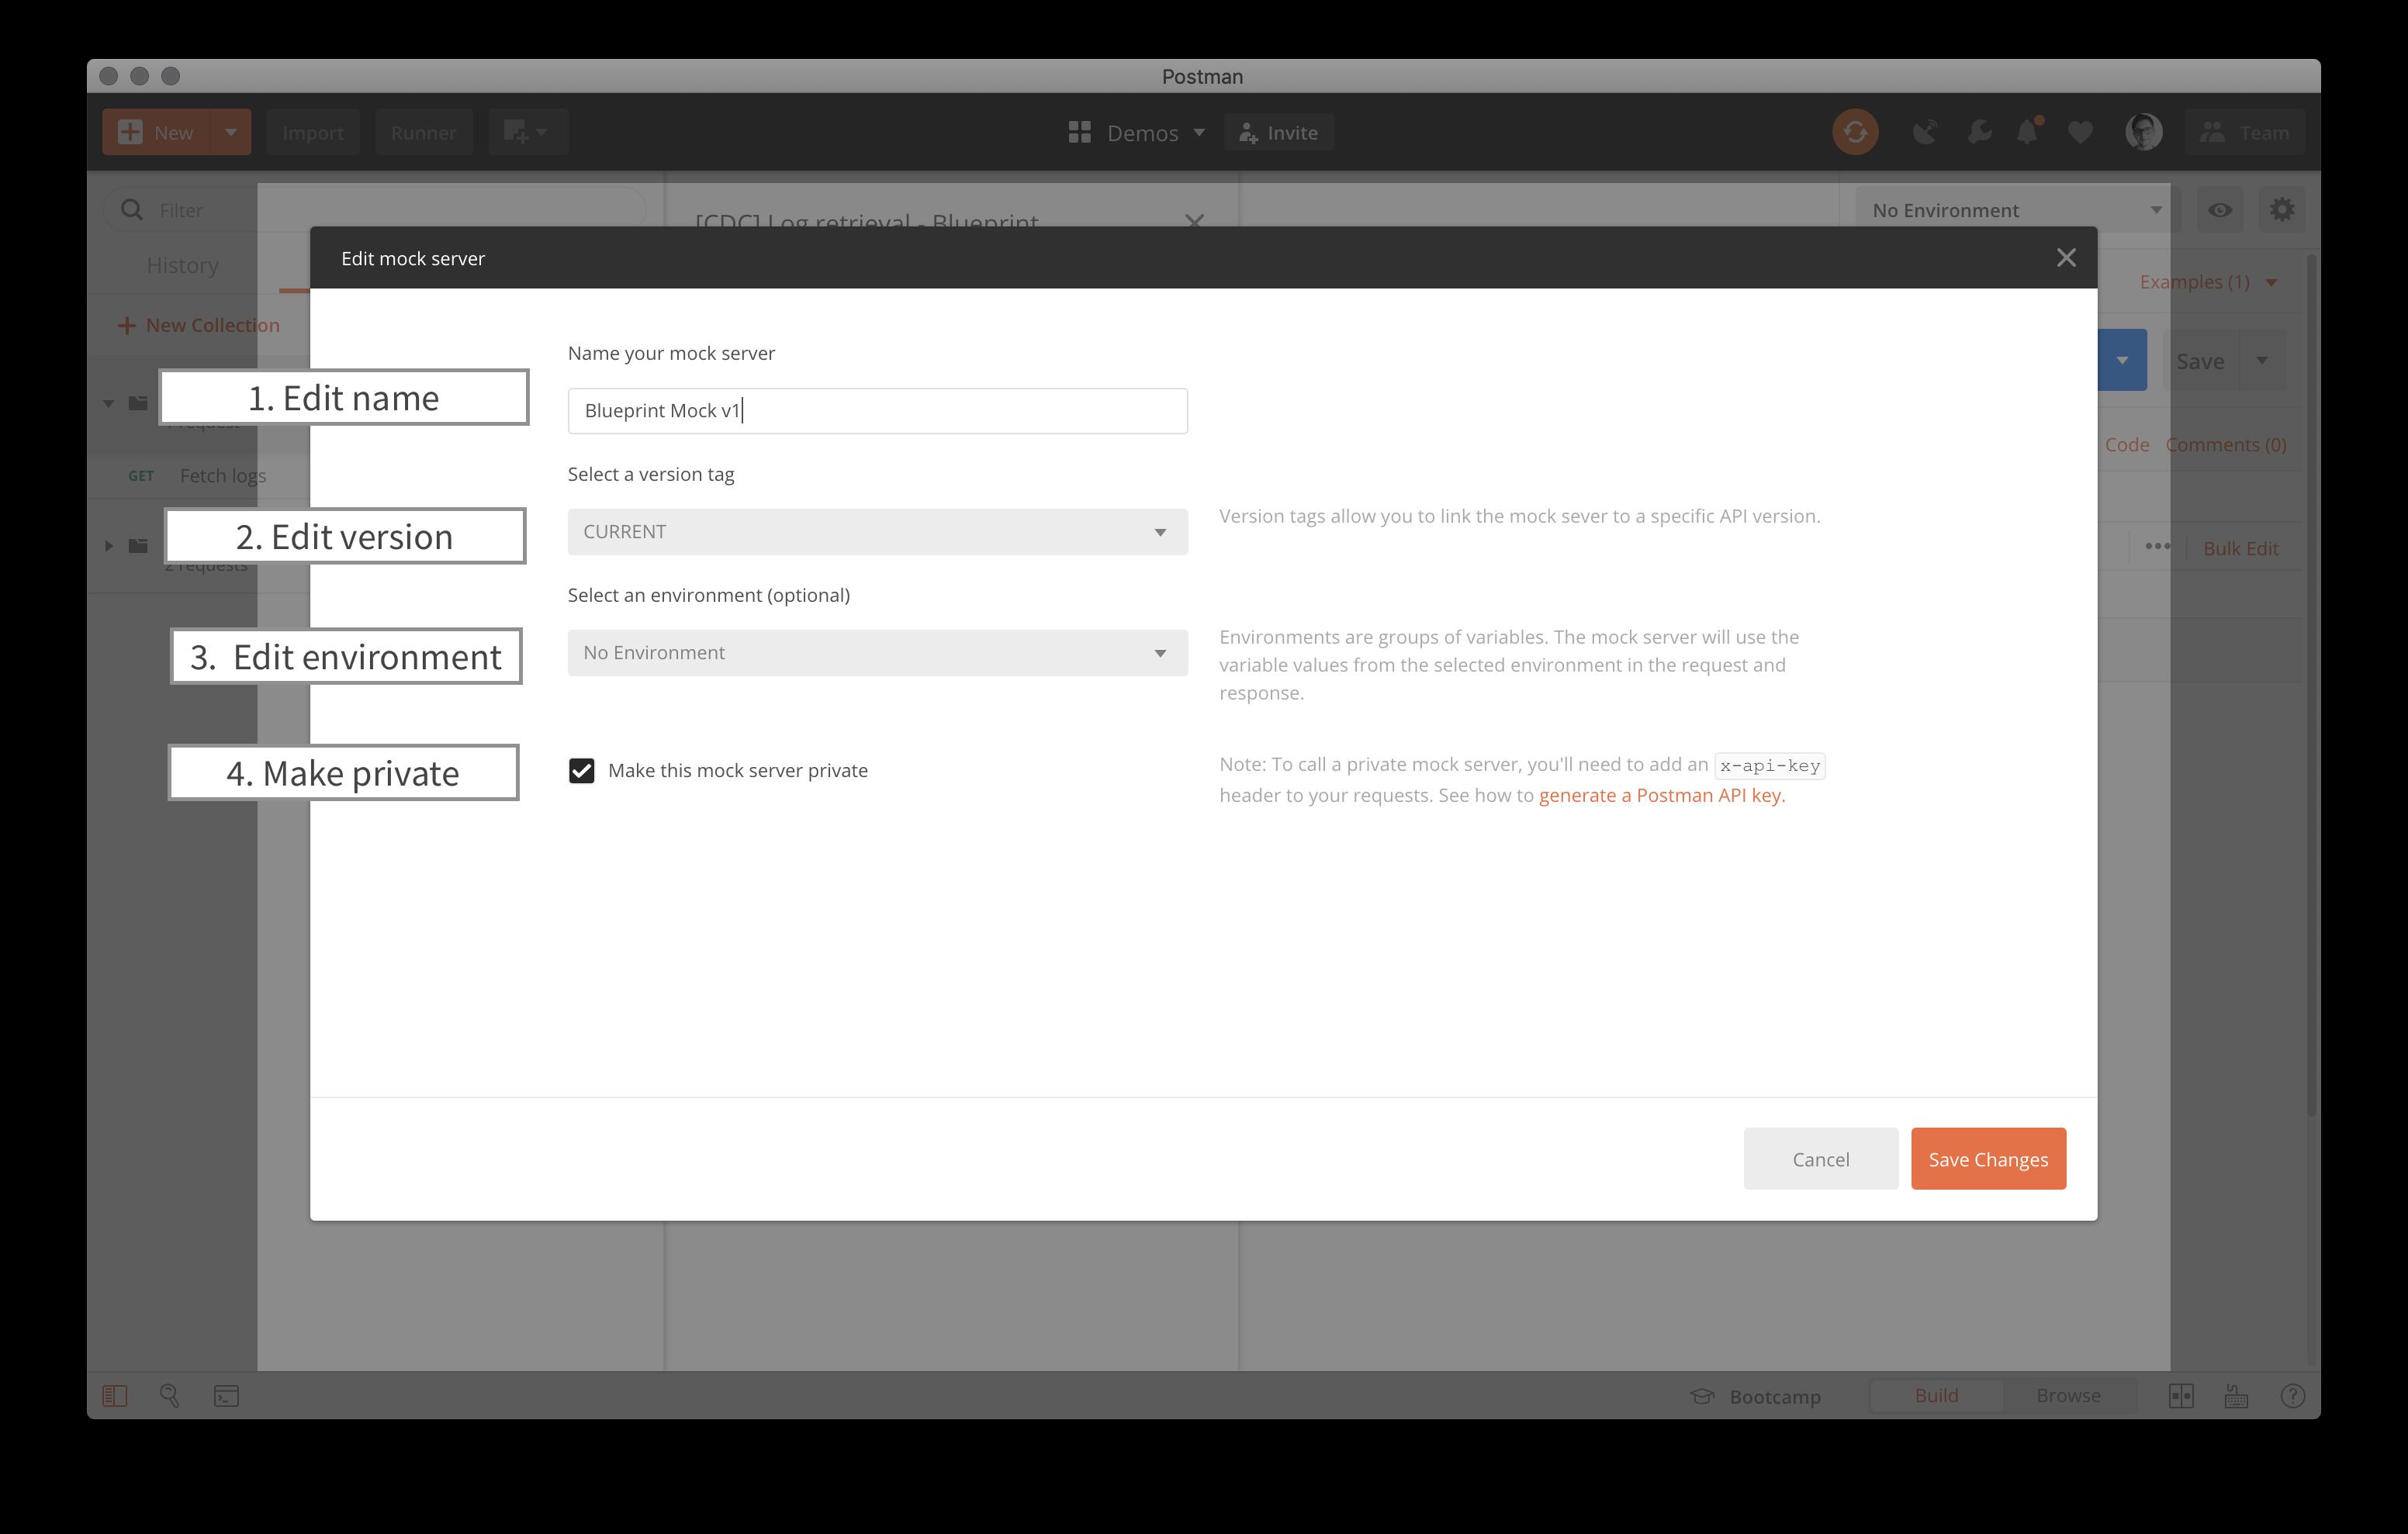 Postman Mock Server edit options